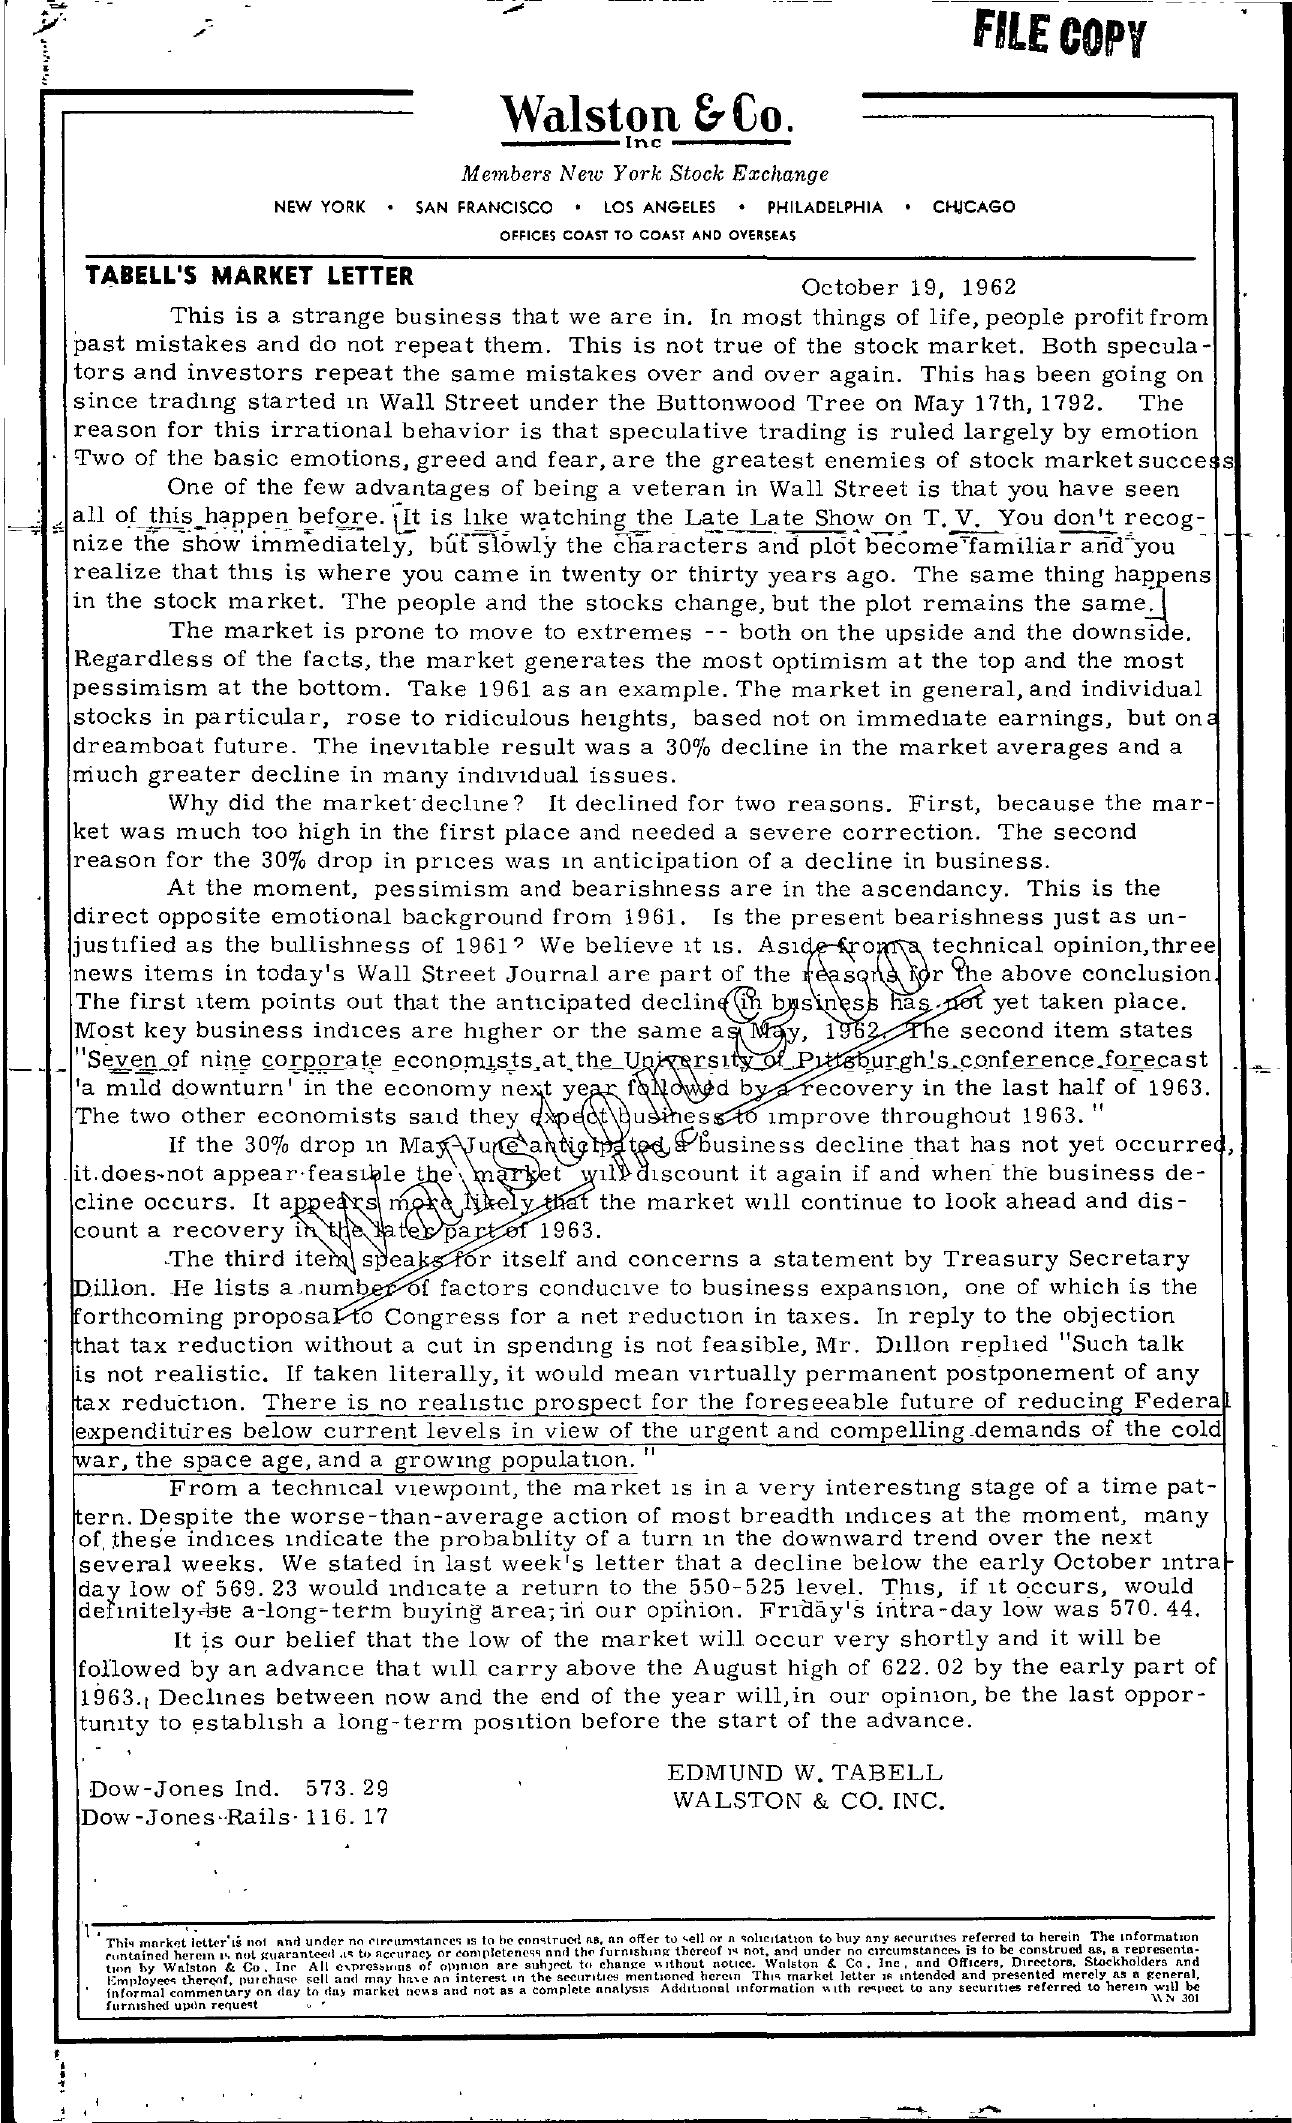 Tabell's Market Letter - October 19, 1962